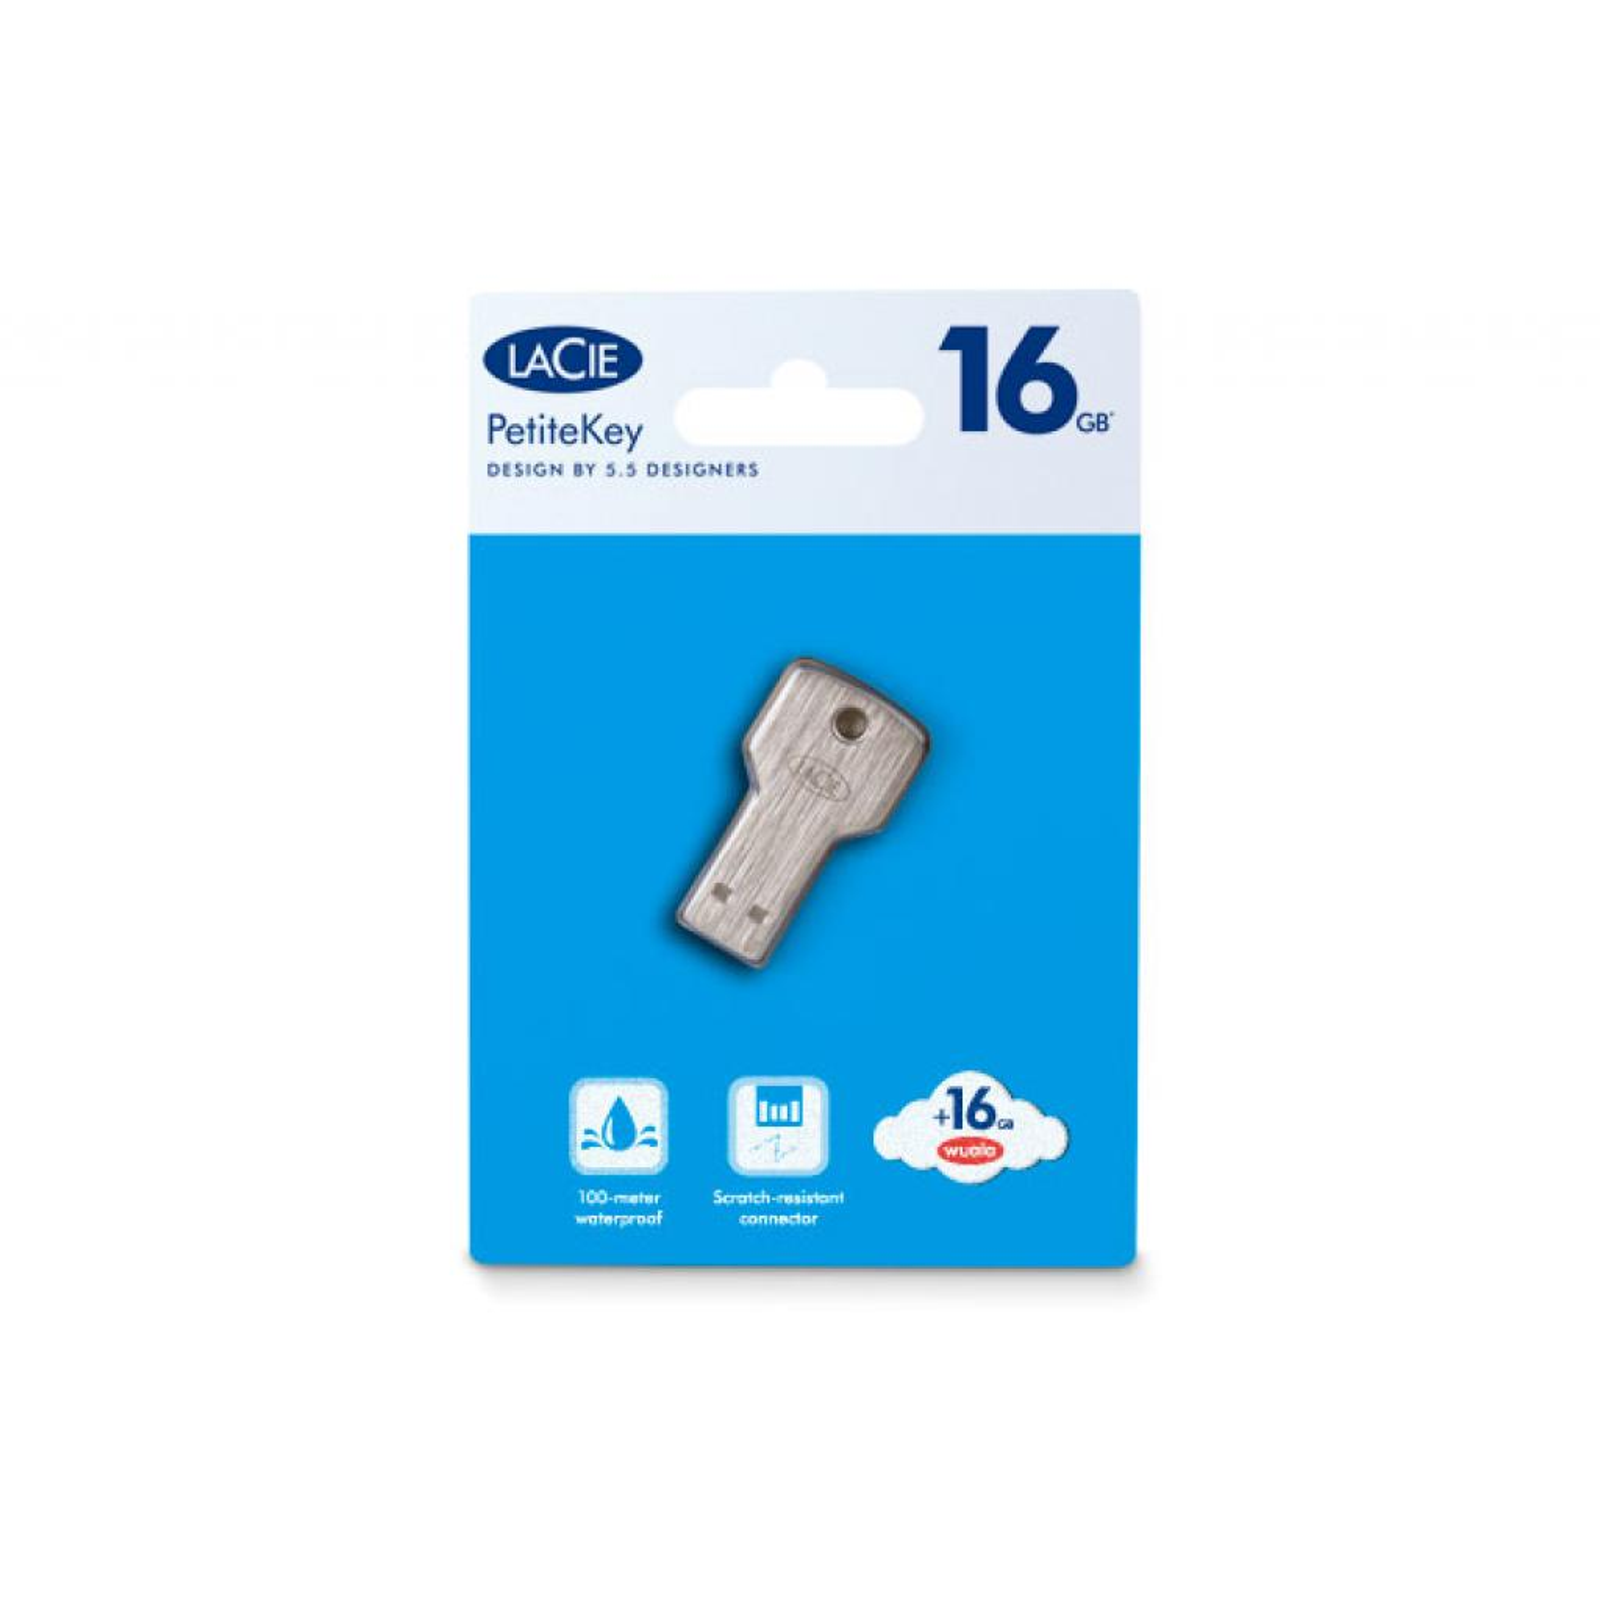 USB флеш накопитель LaCie 16Gb PetiteKey (9000347) изображение 6